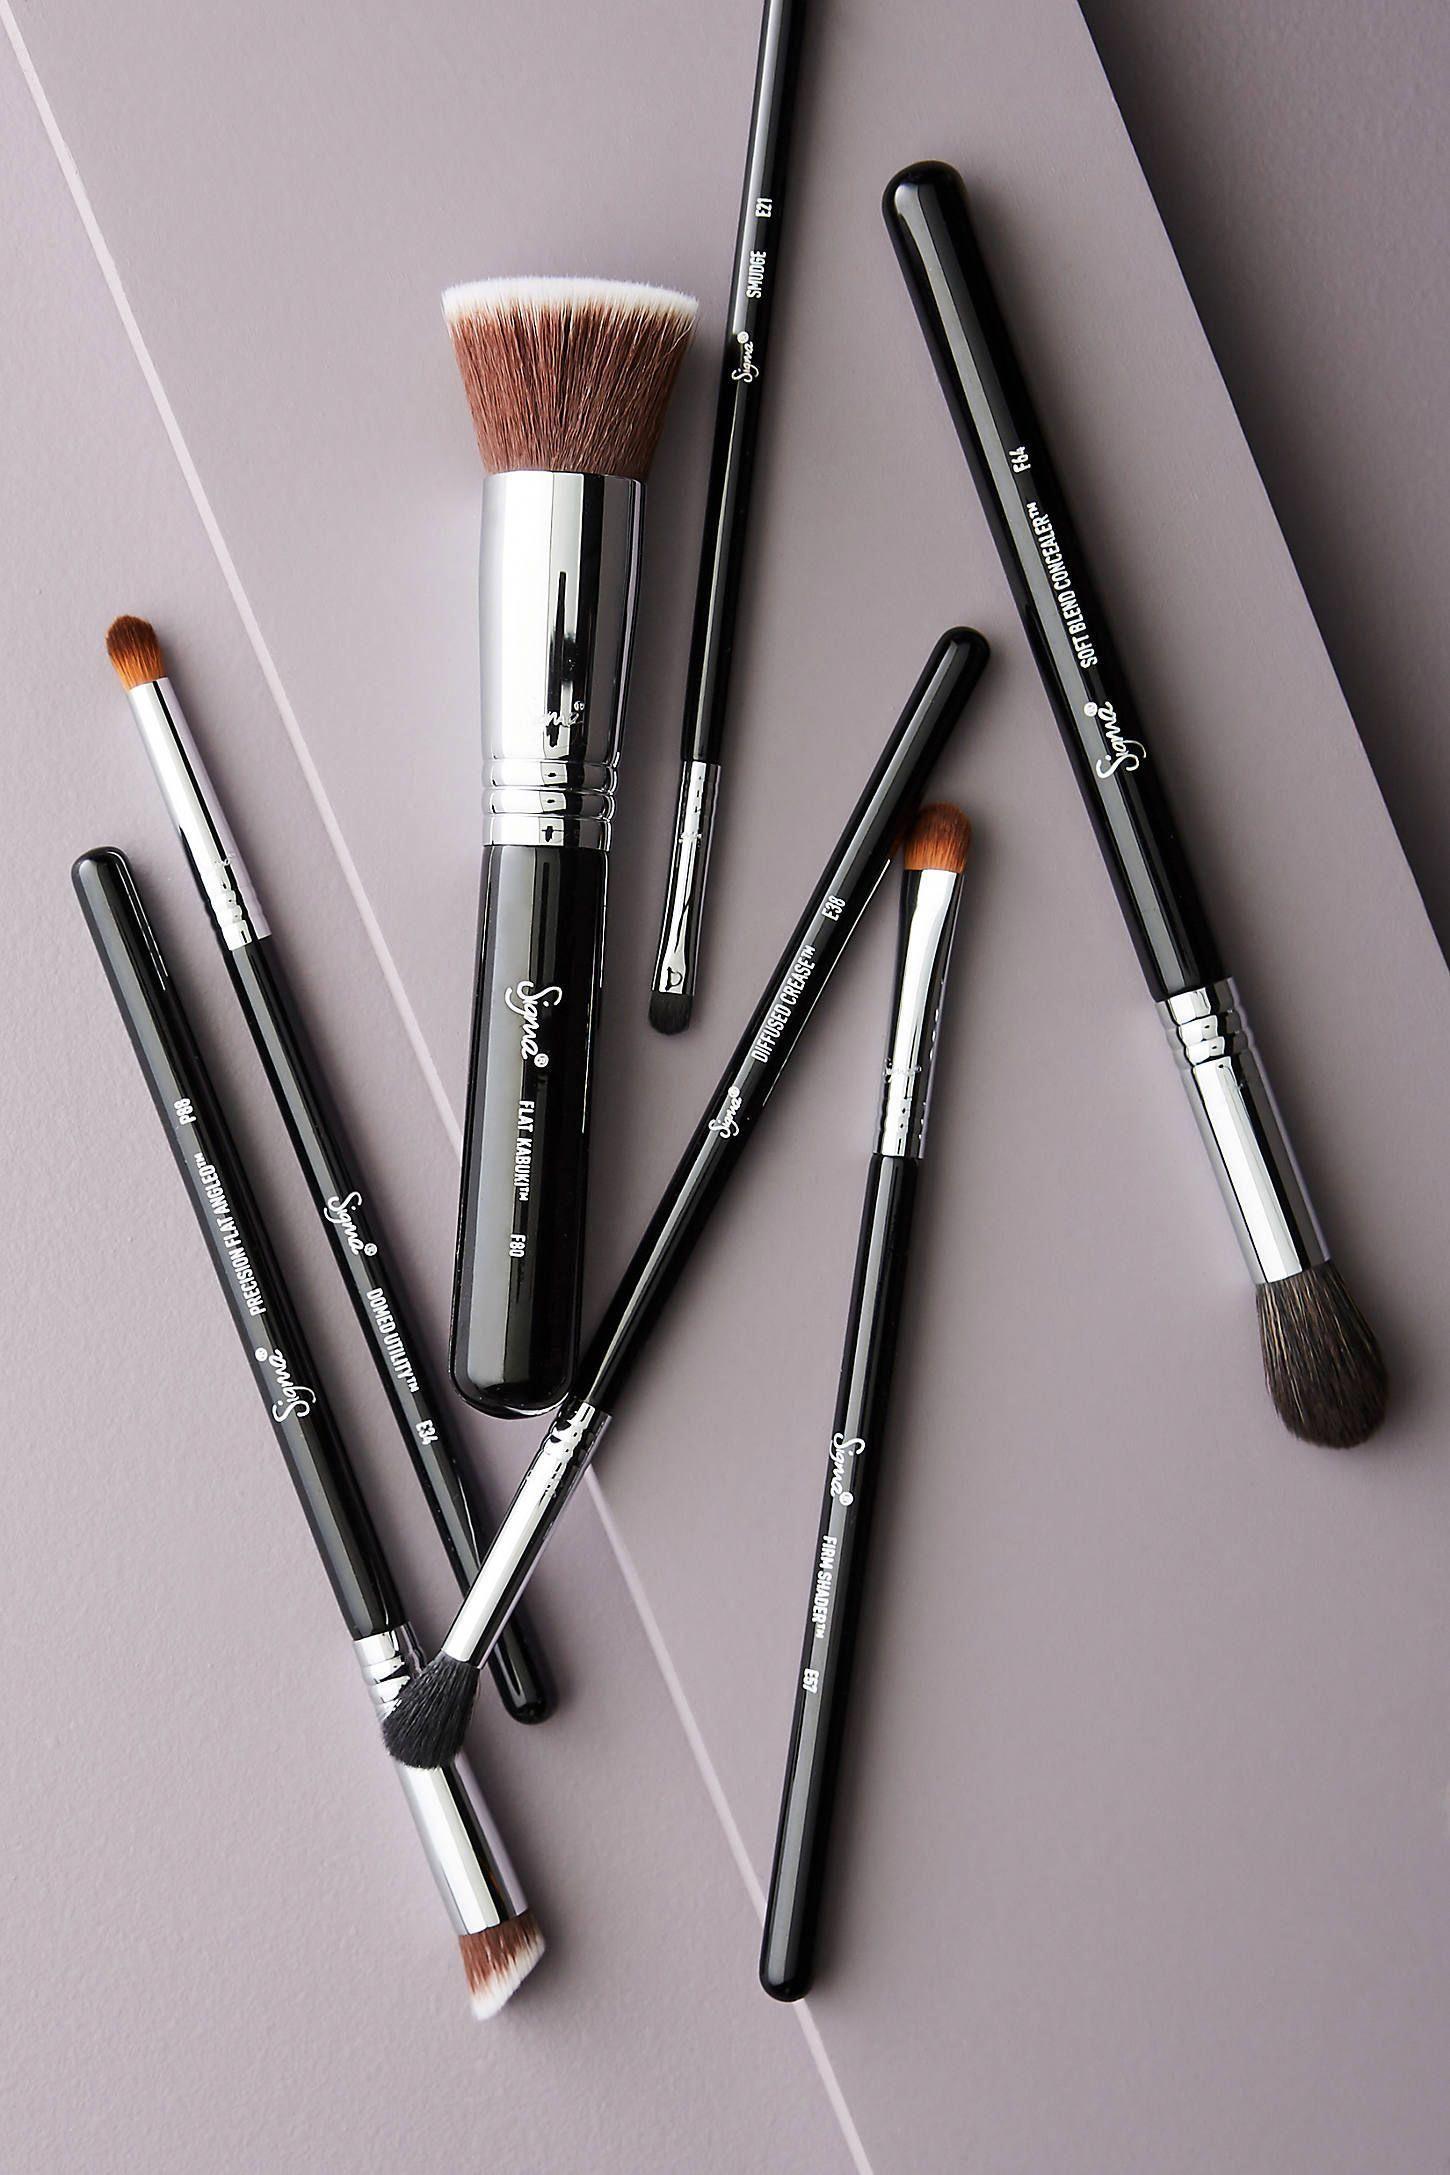 Makeupvideos In 2020 Sigma Makeup Brushes Makeup Brush Set Face Brush Set